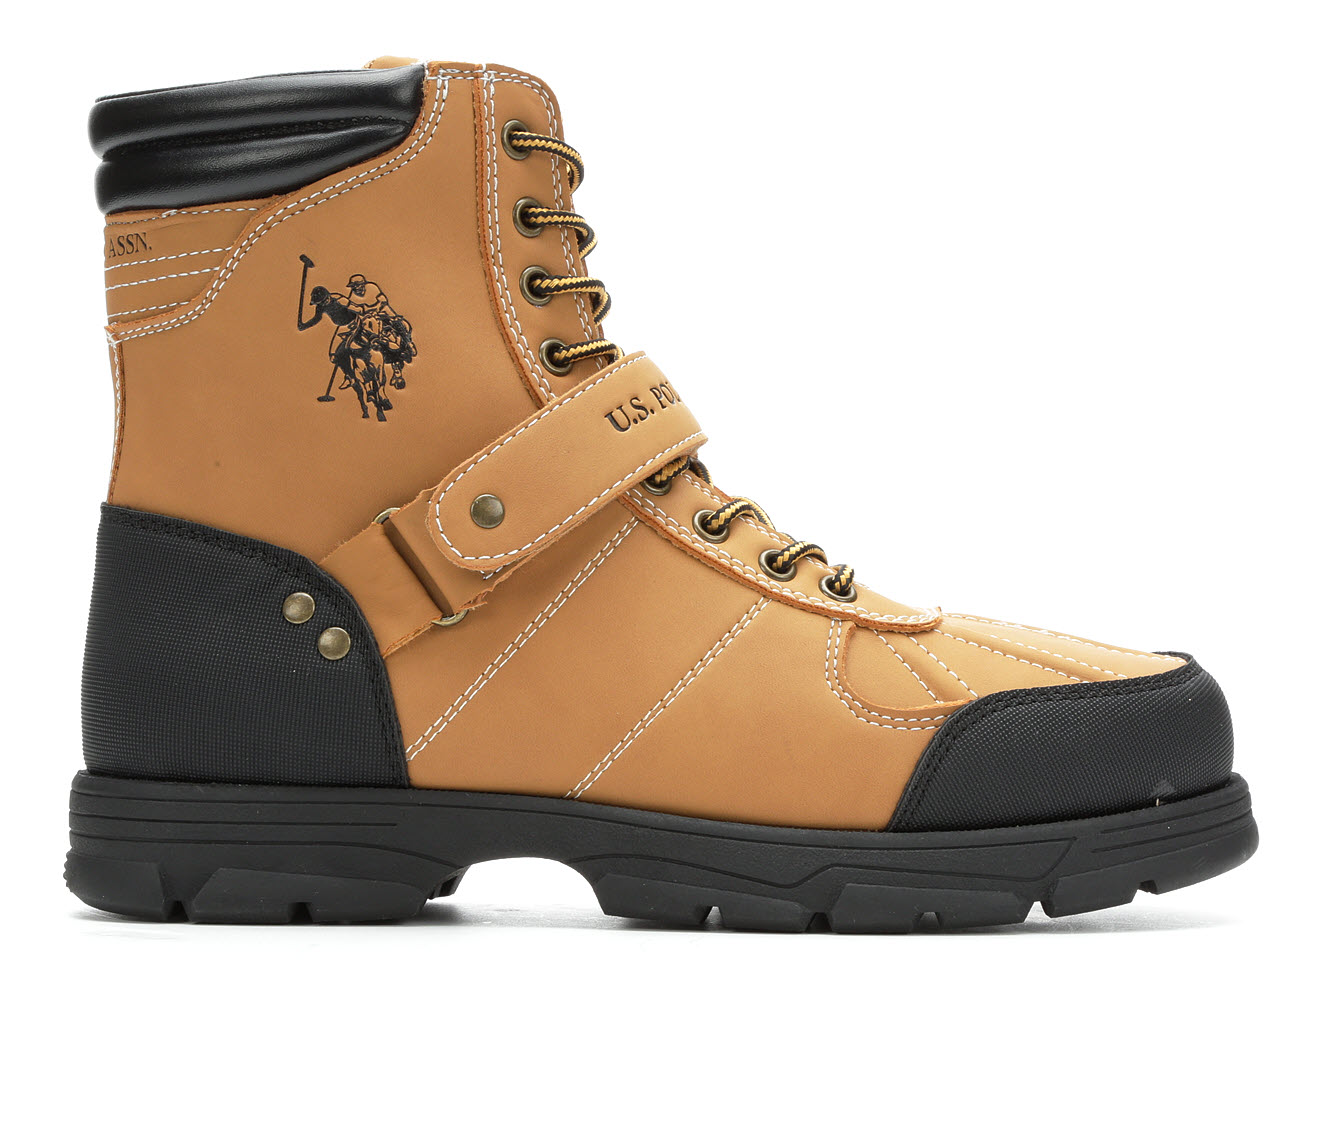 US Polo Assn Connor Men's Boots (Beige Faux Leather)